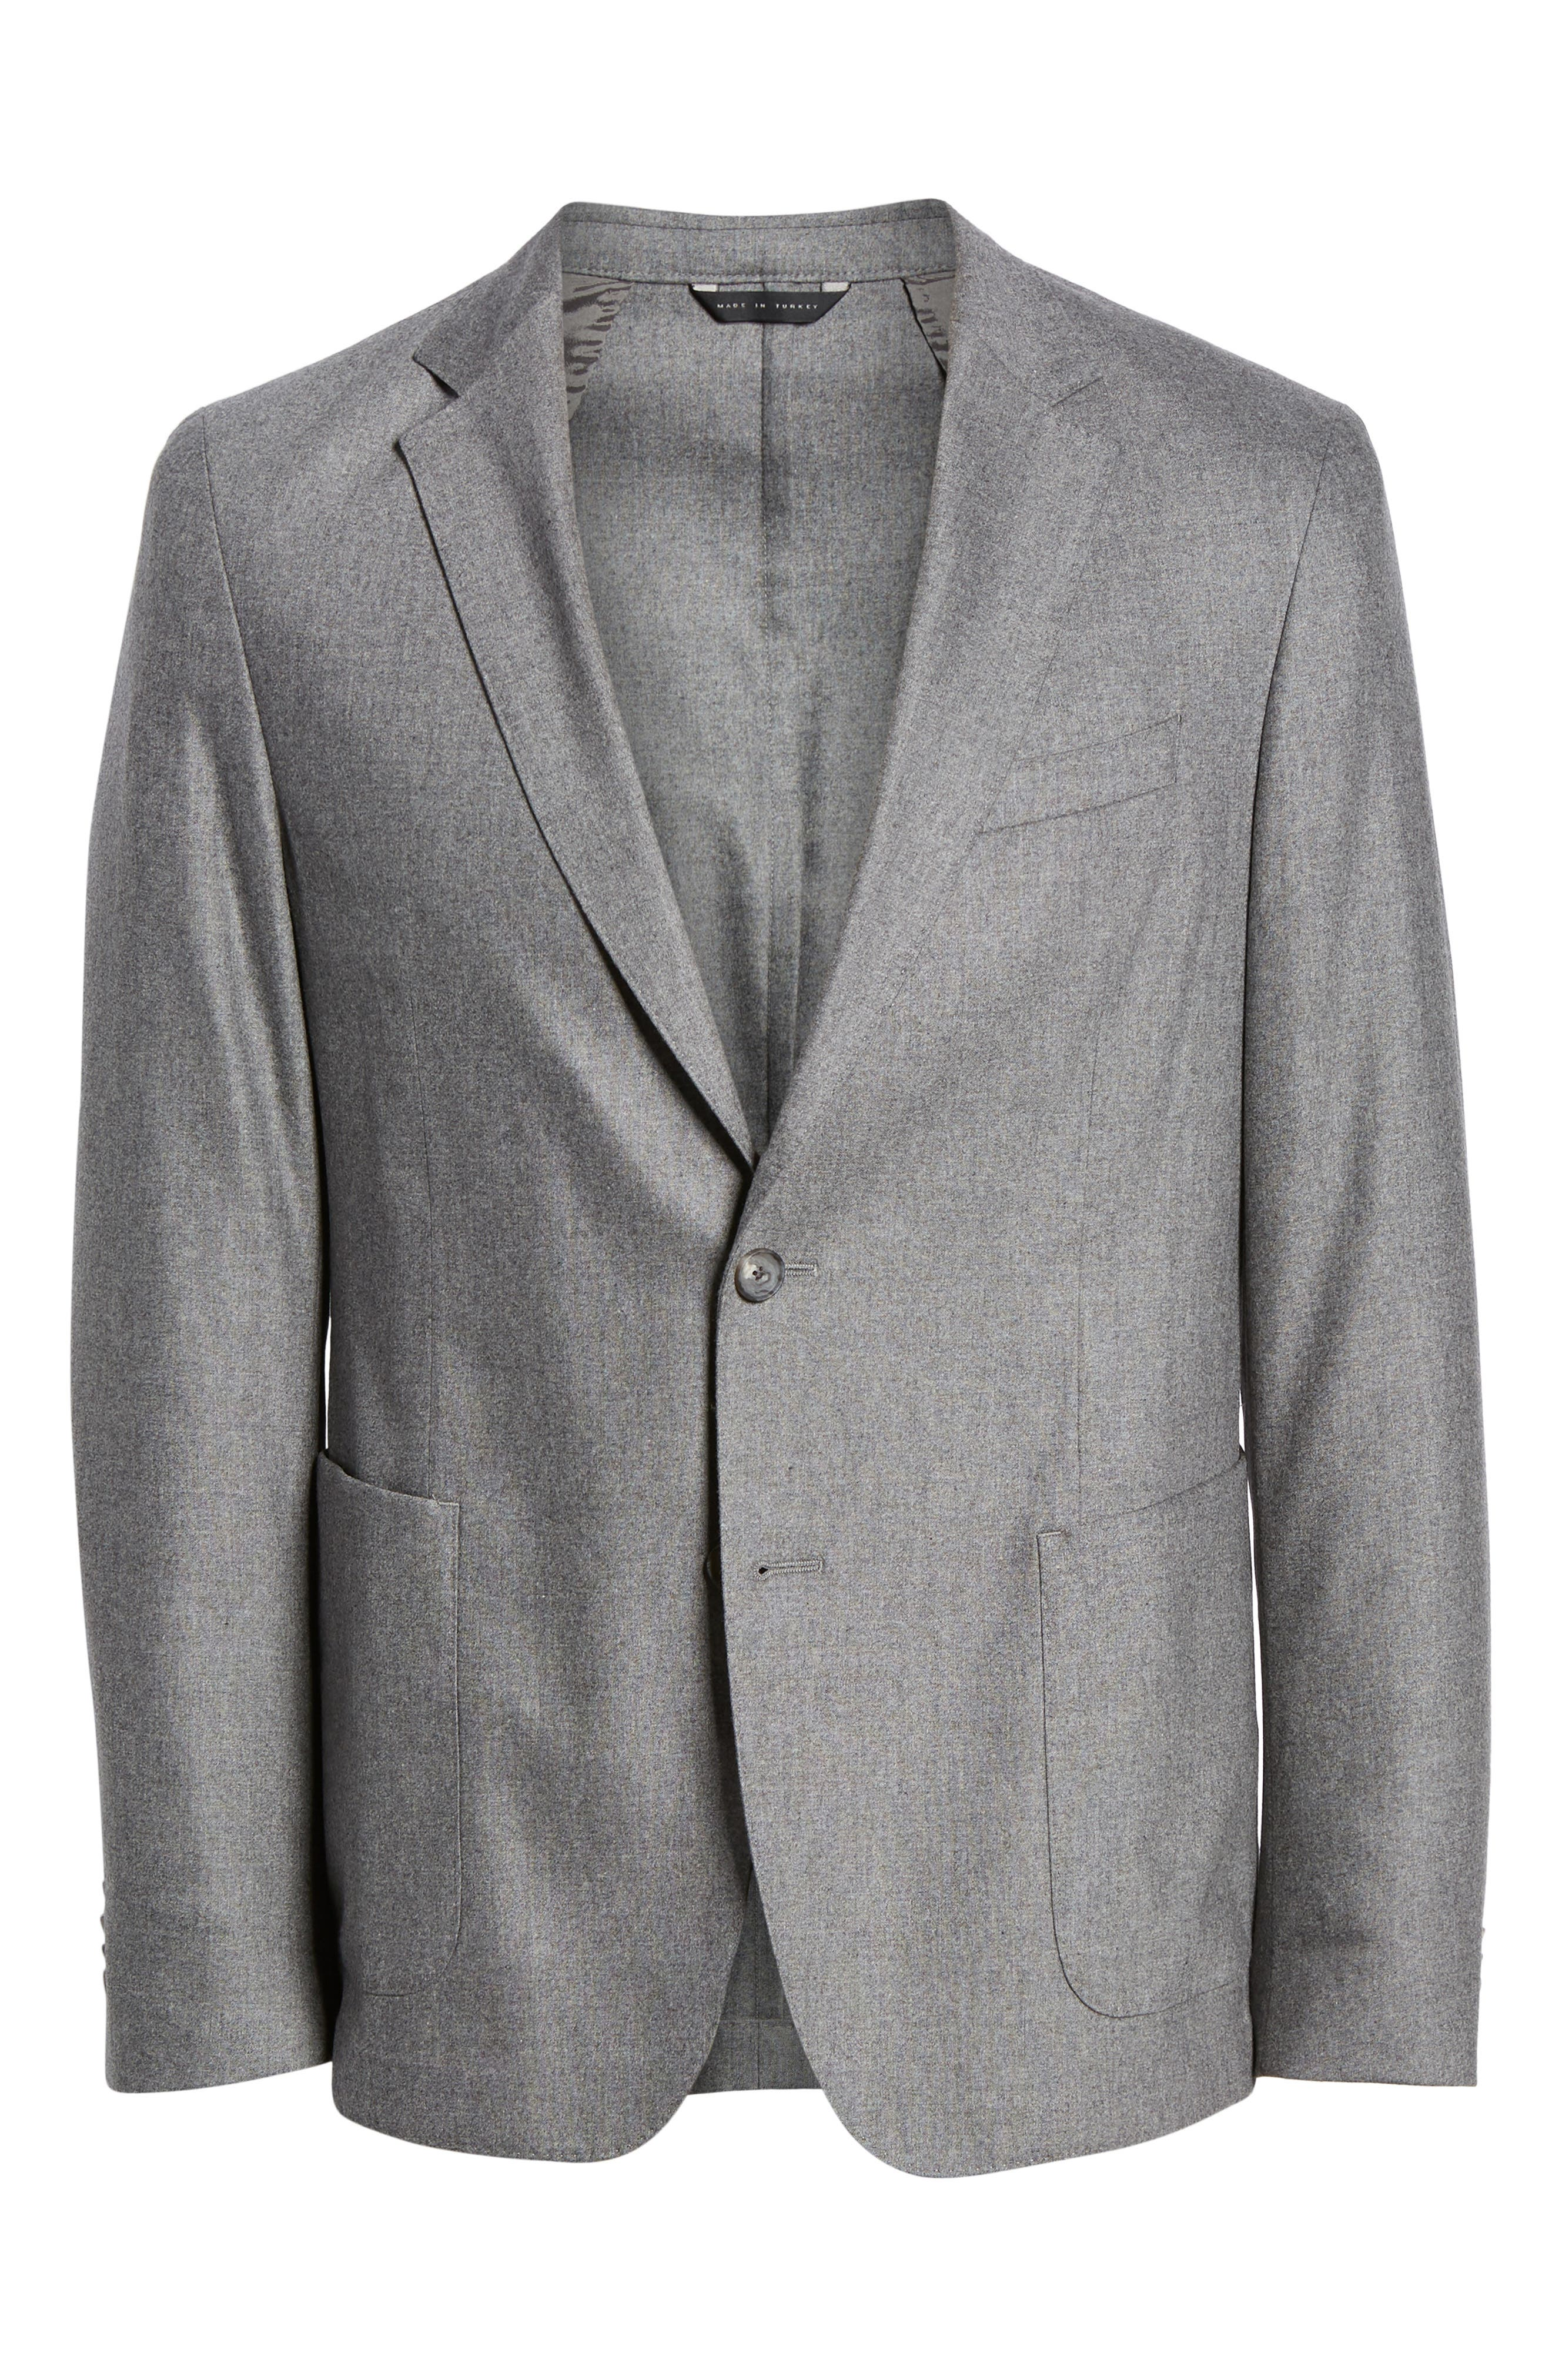 Nold Trim Fit Stretch Wool Blend Blazer,                             Alternate thumbnail 5, color,                             MEDIUM GREY